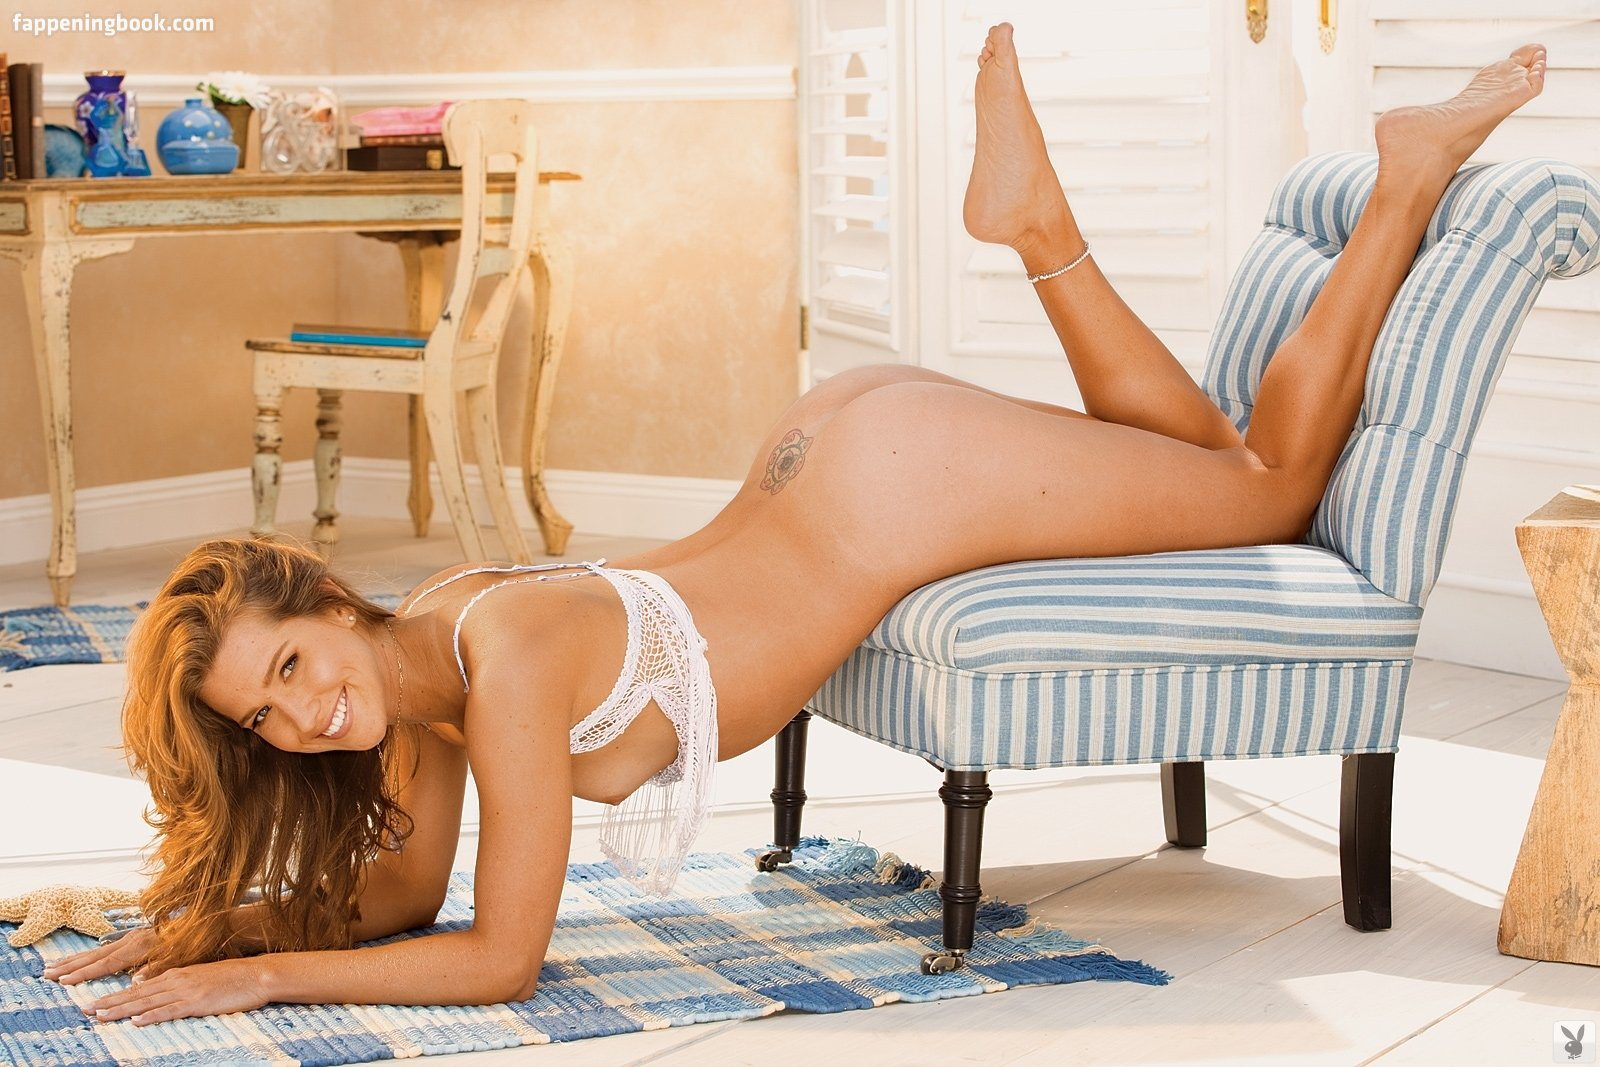 Breanne ashley nude